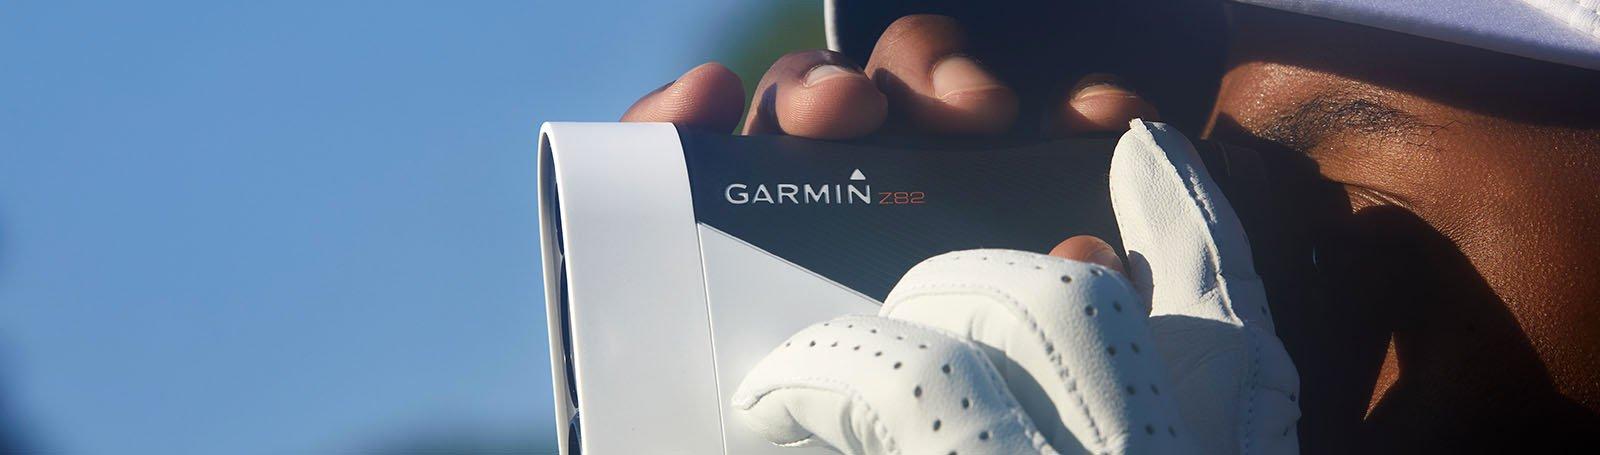 Garmin Z82